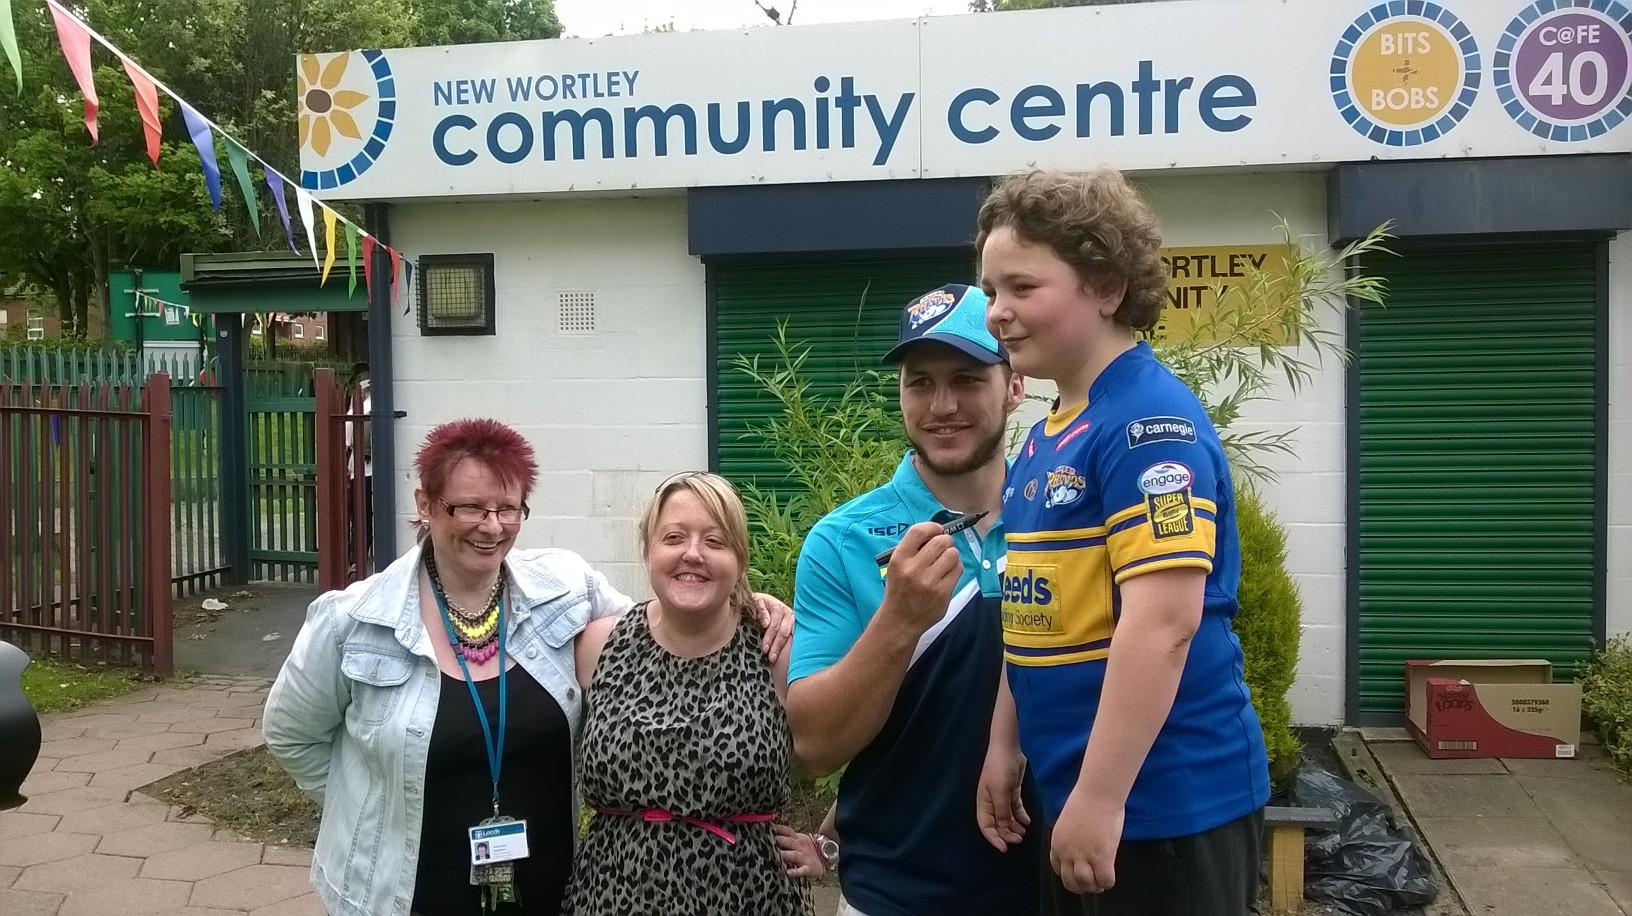 Leeds Rhinos' Tom Briscoe at New Wortley Community Centre